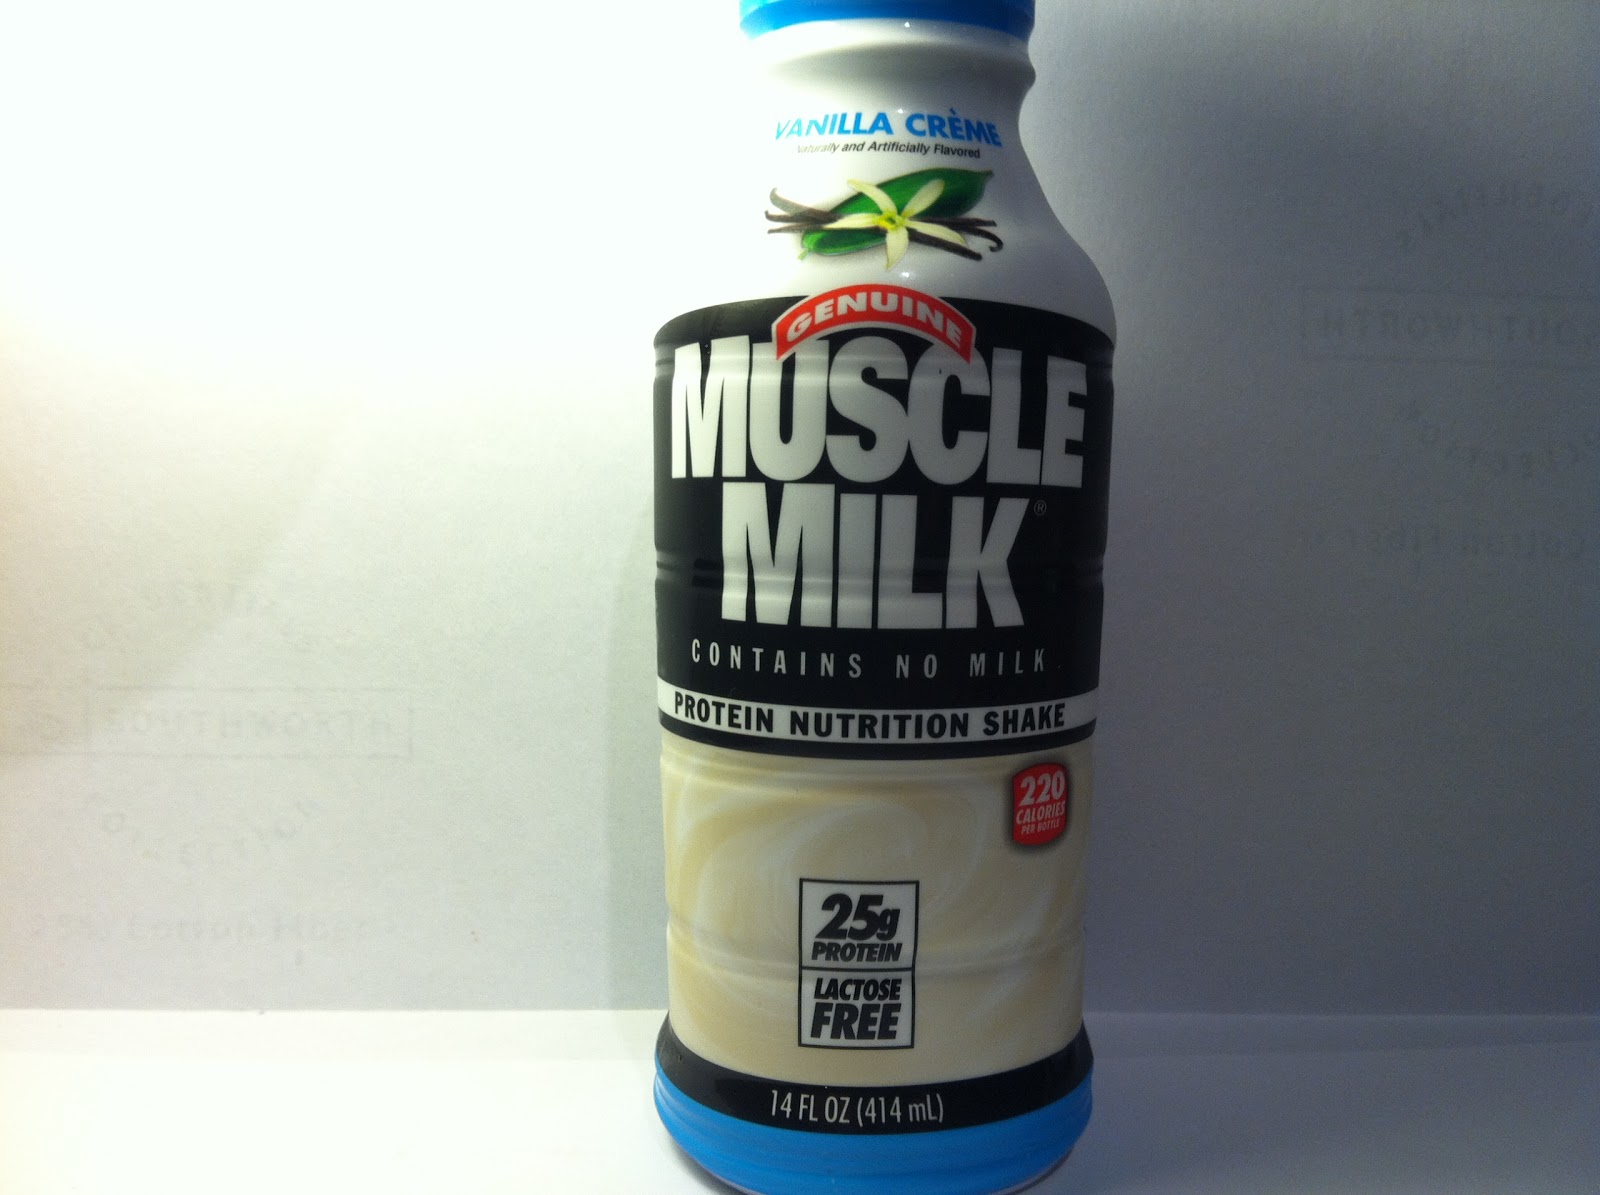 Muscle milk shake coupons